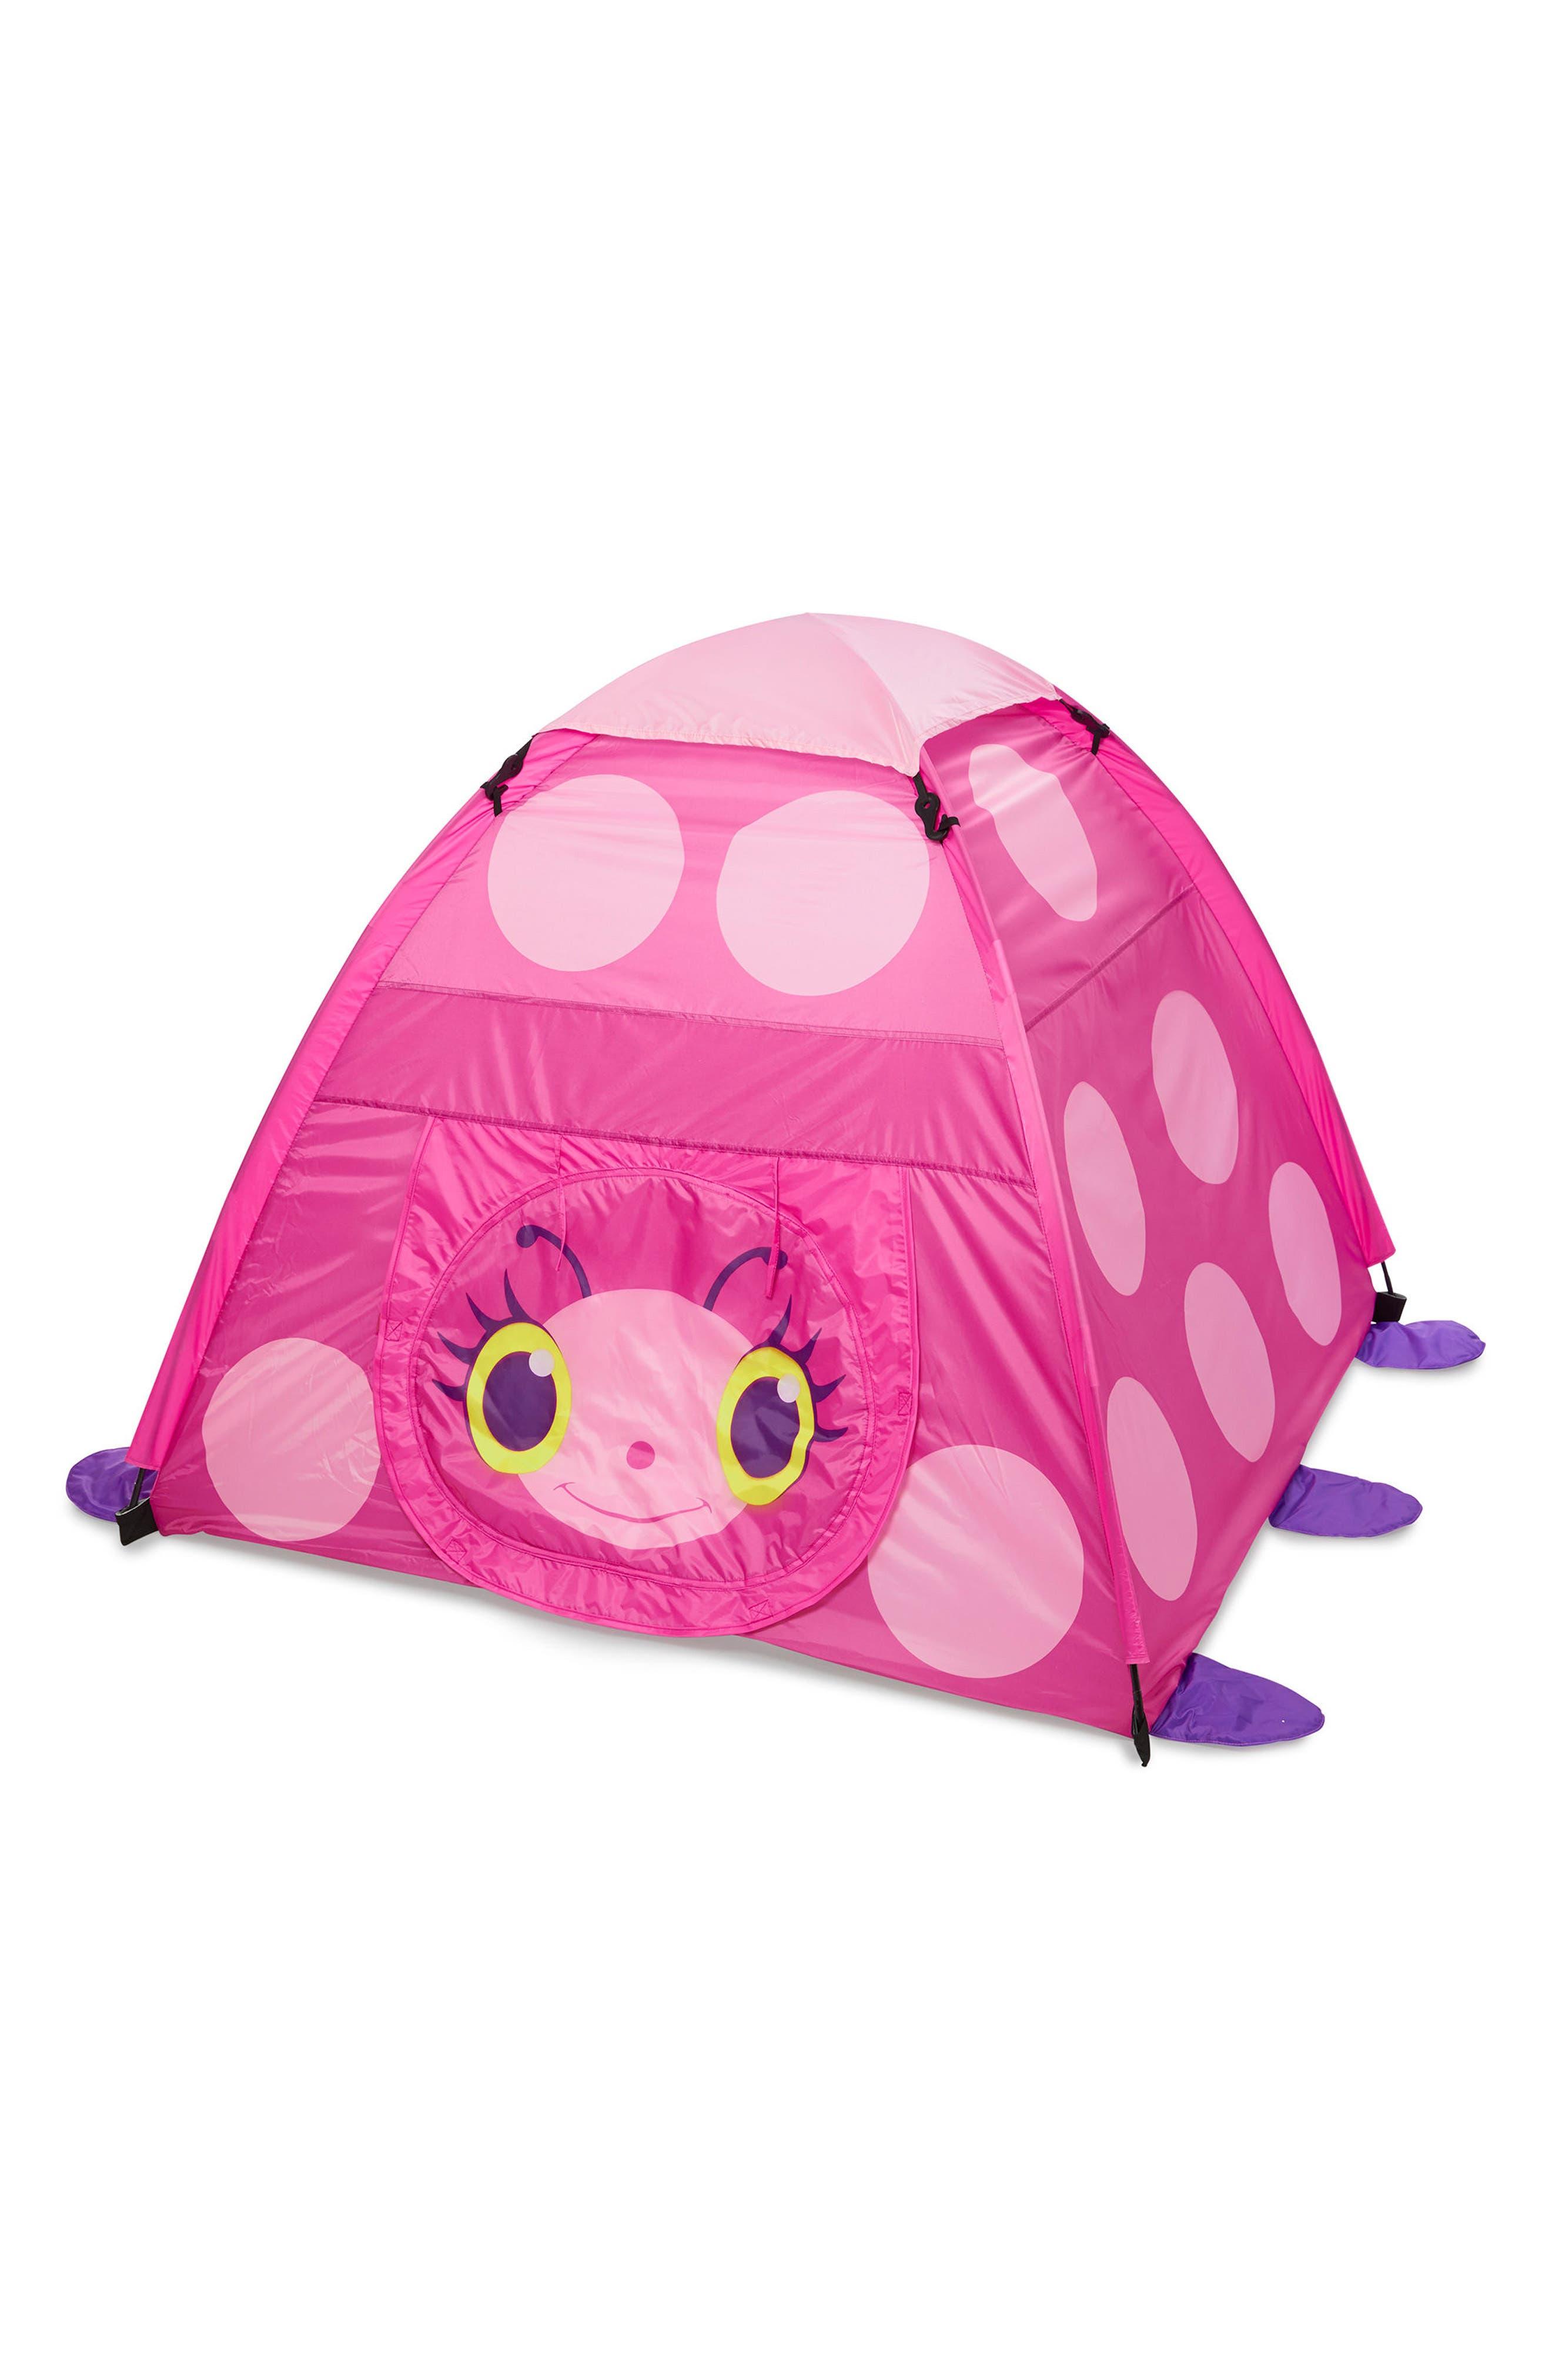 Trixie Ladybug Tent,                         Main,                         color, Pink Multi